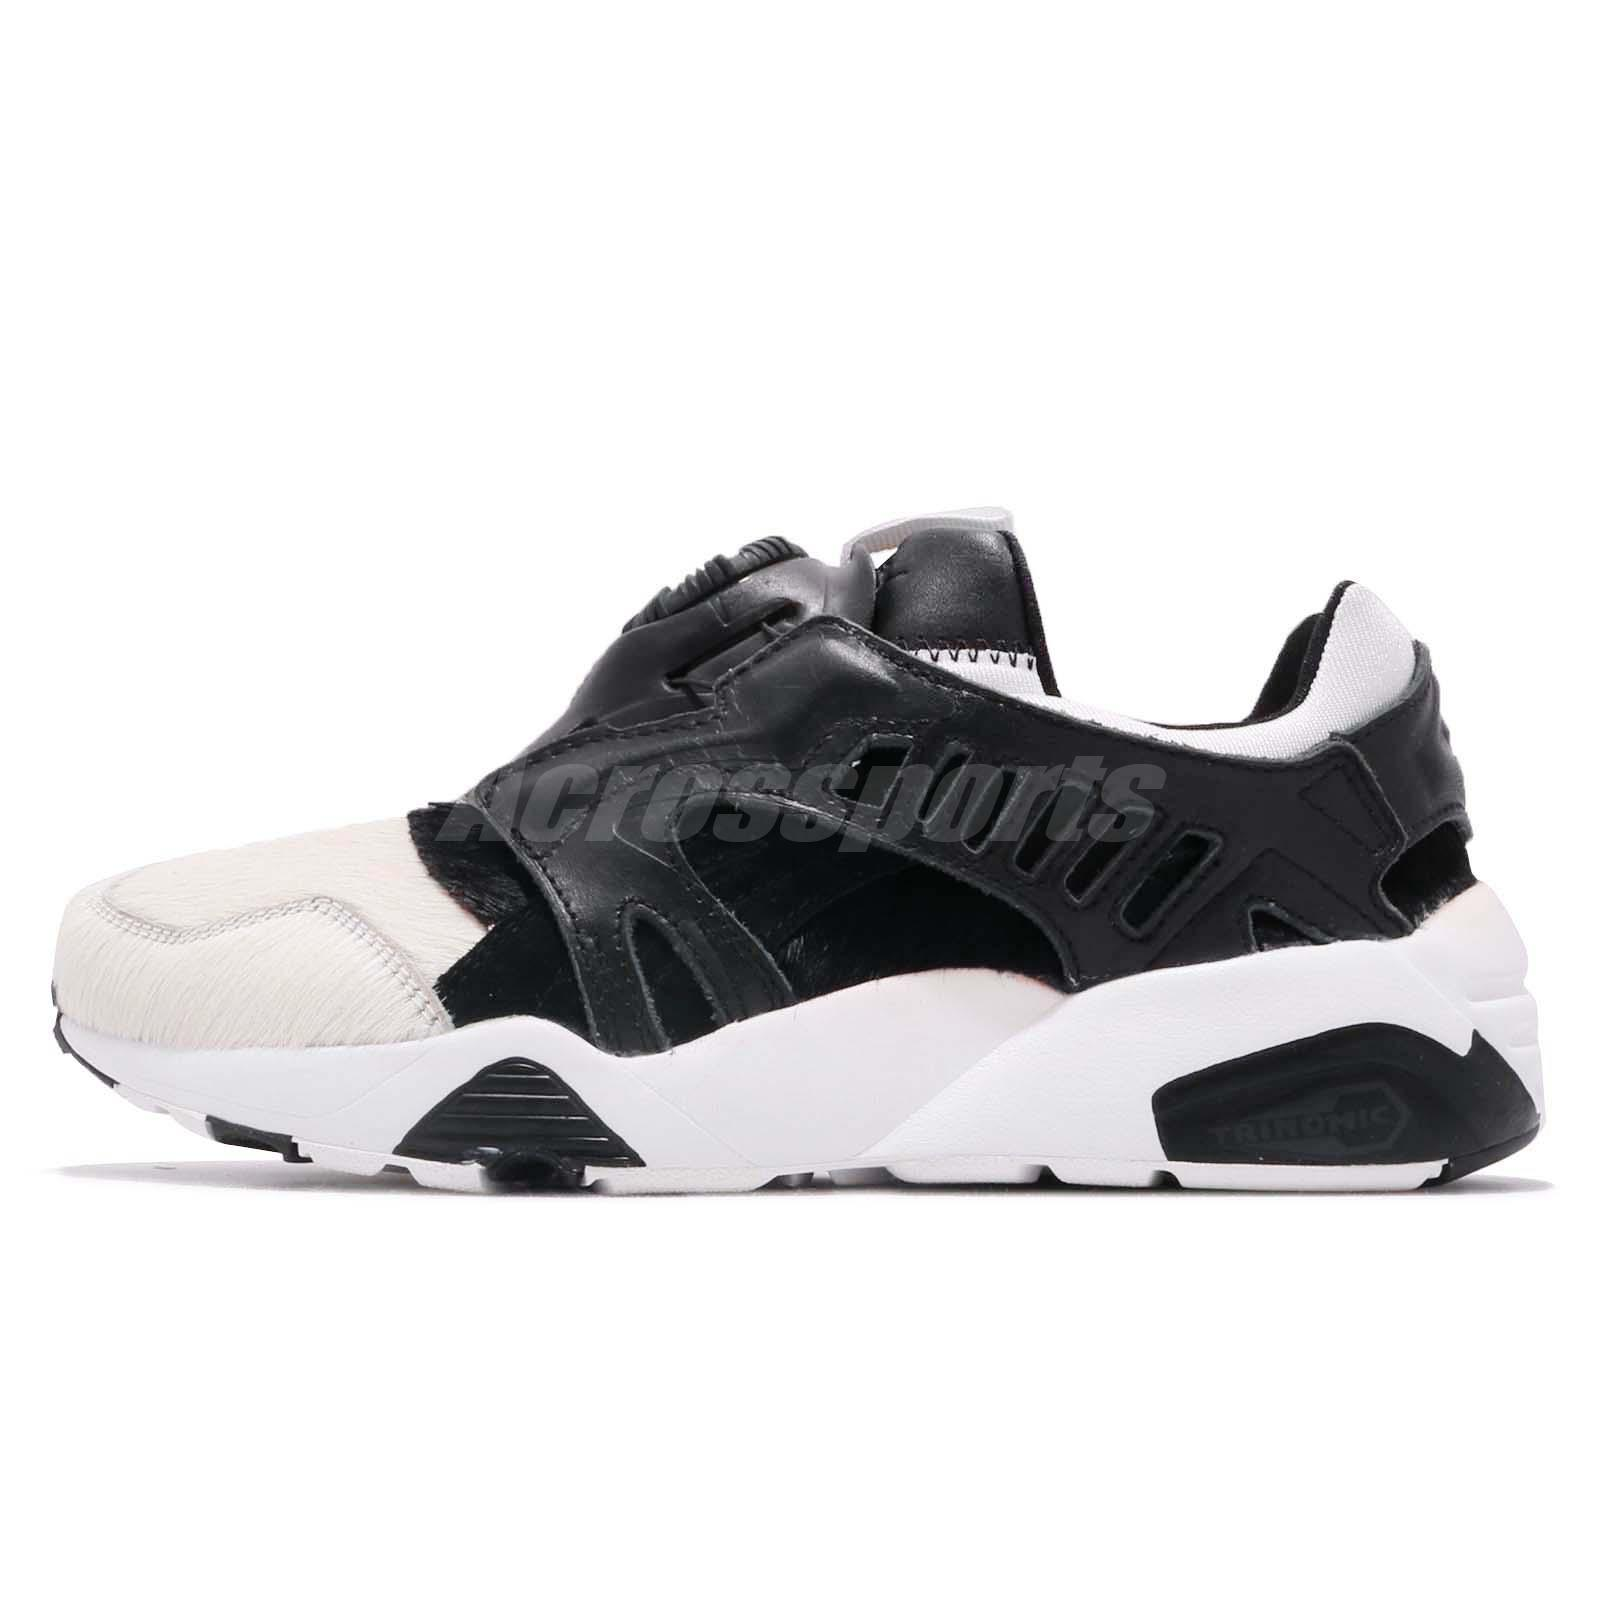 7a8936d1cca Puma Disc Panda By Deal White Black Women Running Shoes Sneakers 361382-01